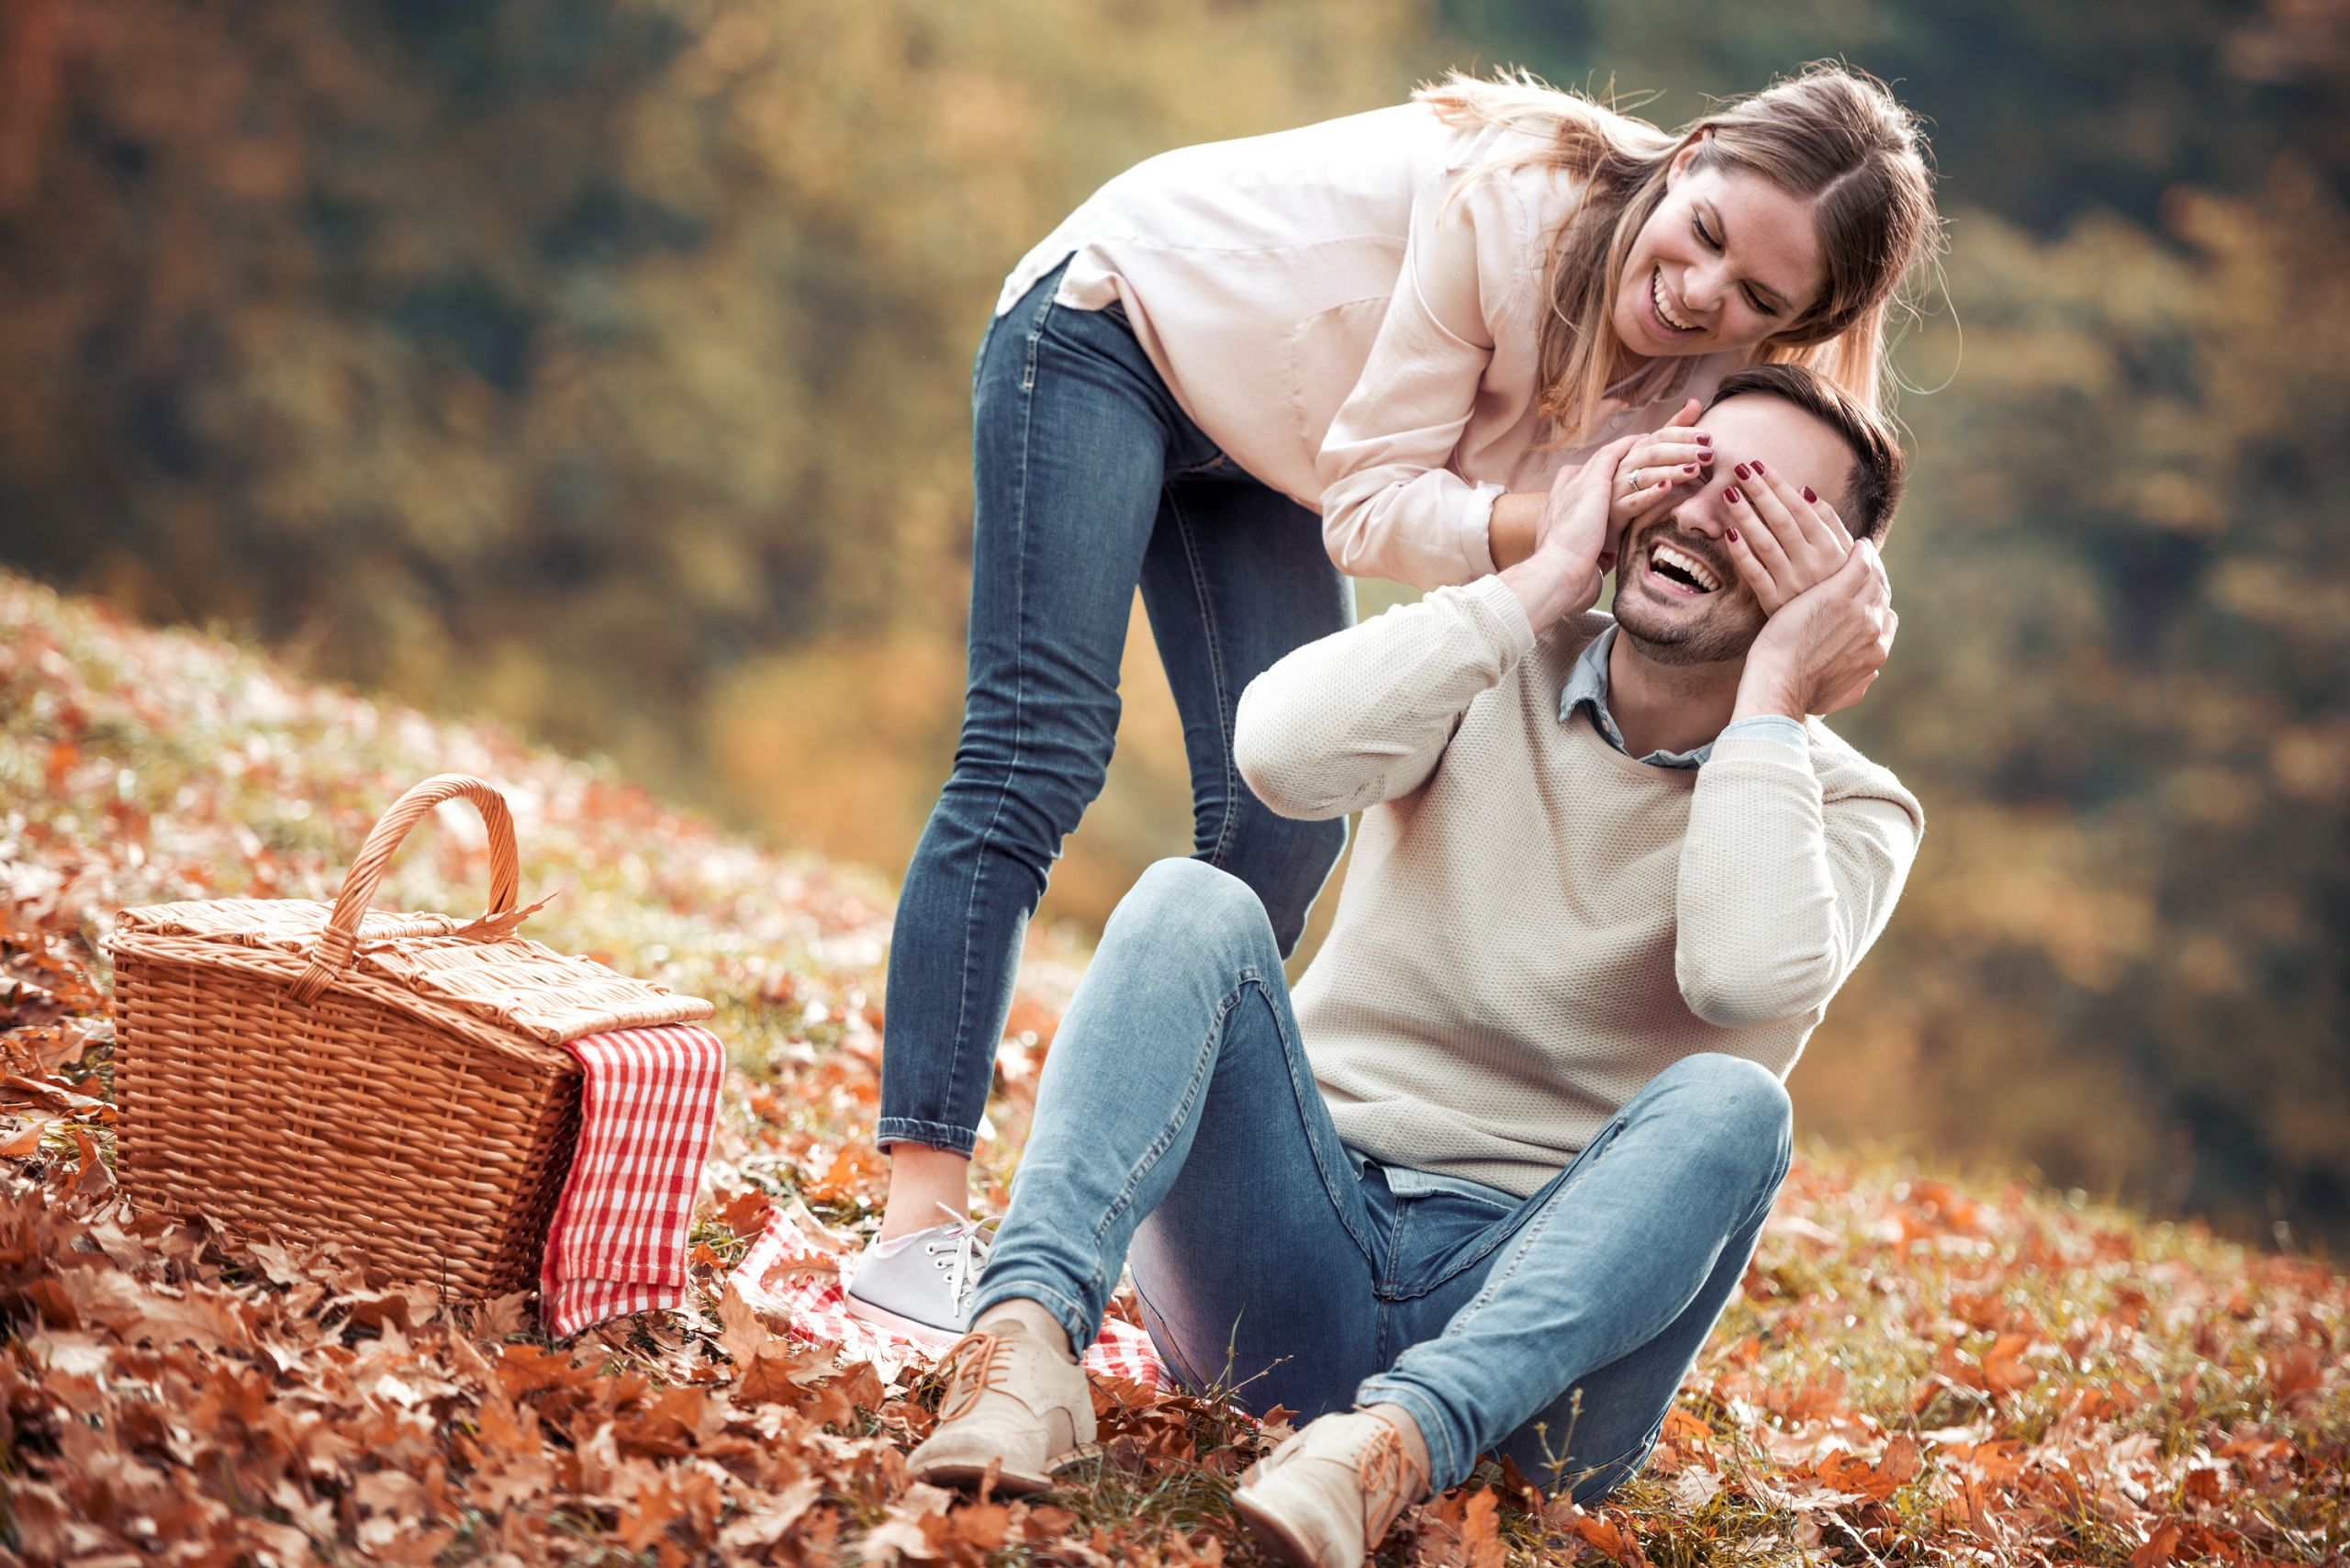 Dating-ideen über 50